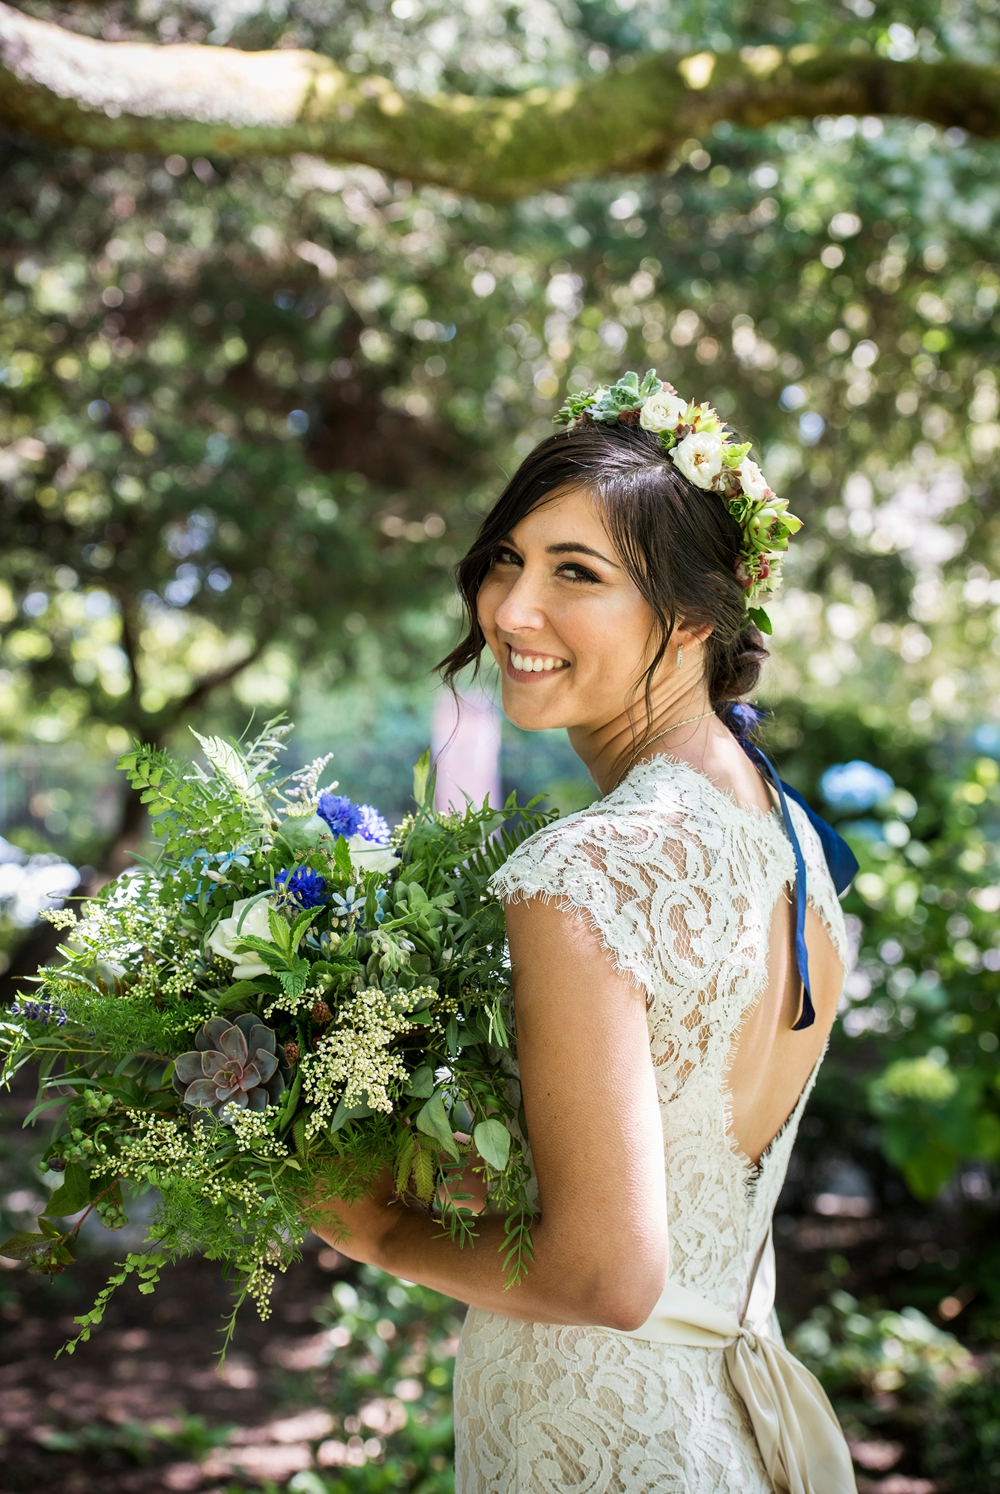 PNW-ferns-at-fremont-foundry-wedding-florist 8.jpg